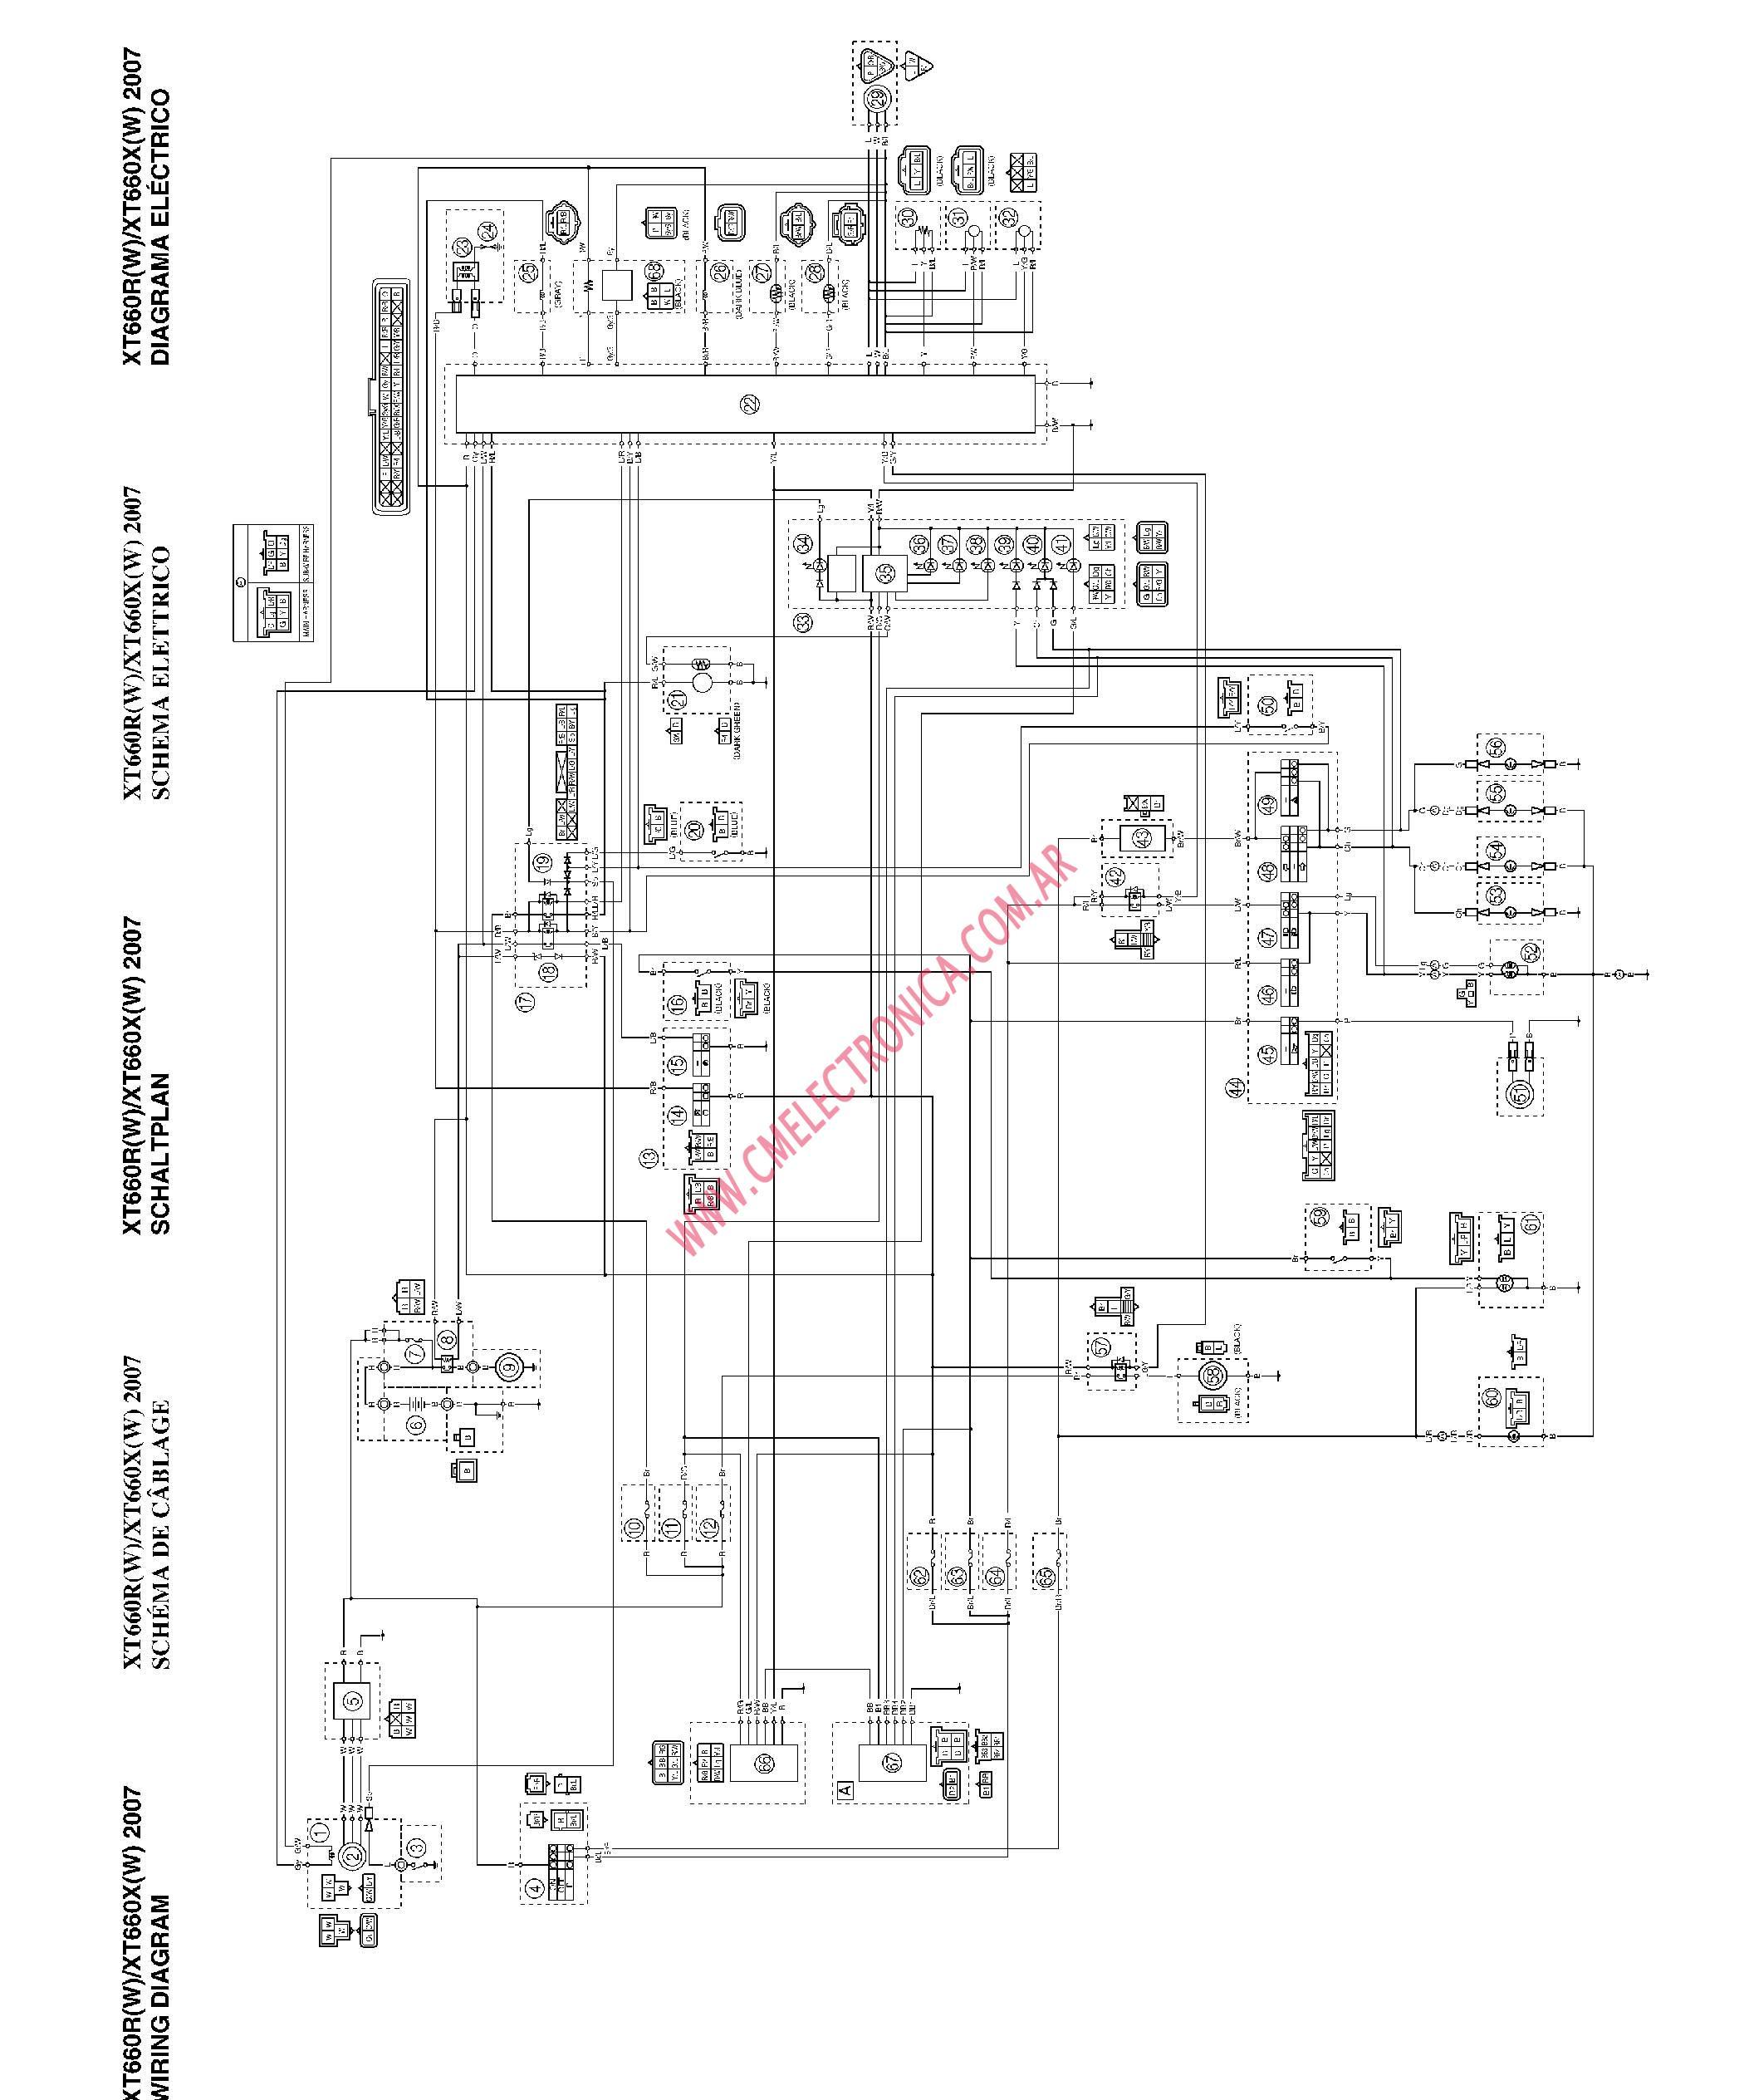 Yamaha R1 2005 Fuse Box  Auto Electrical Wiring Diagram